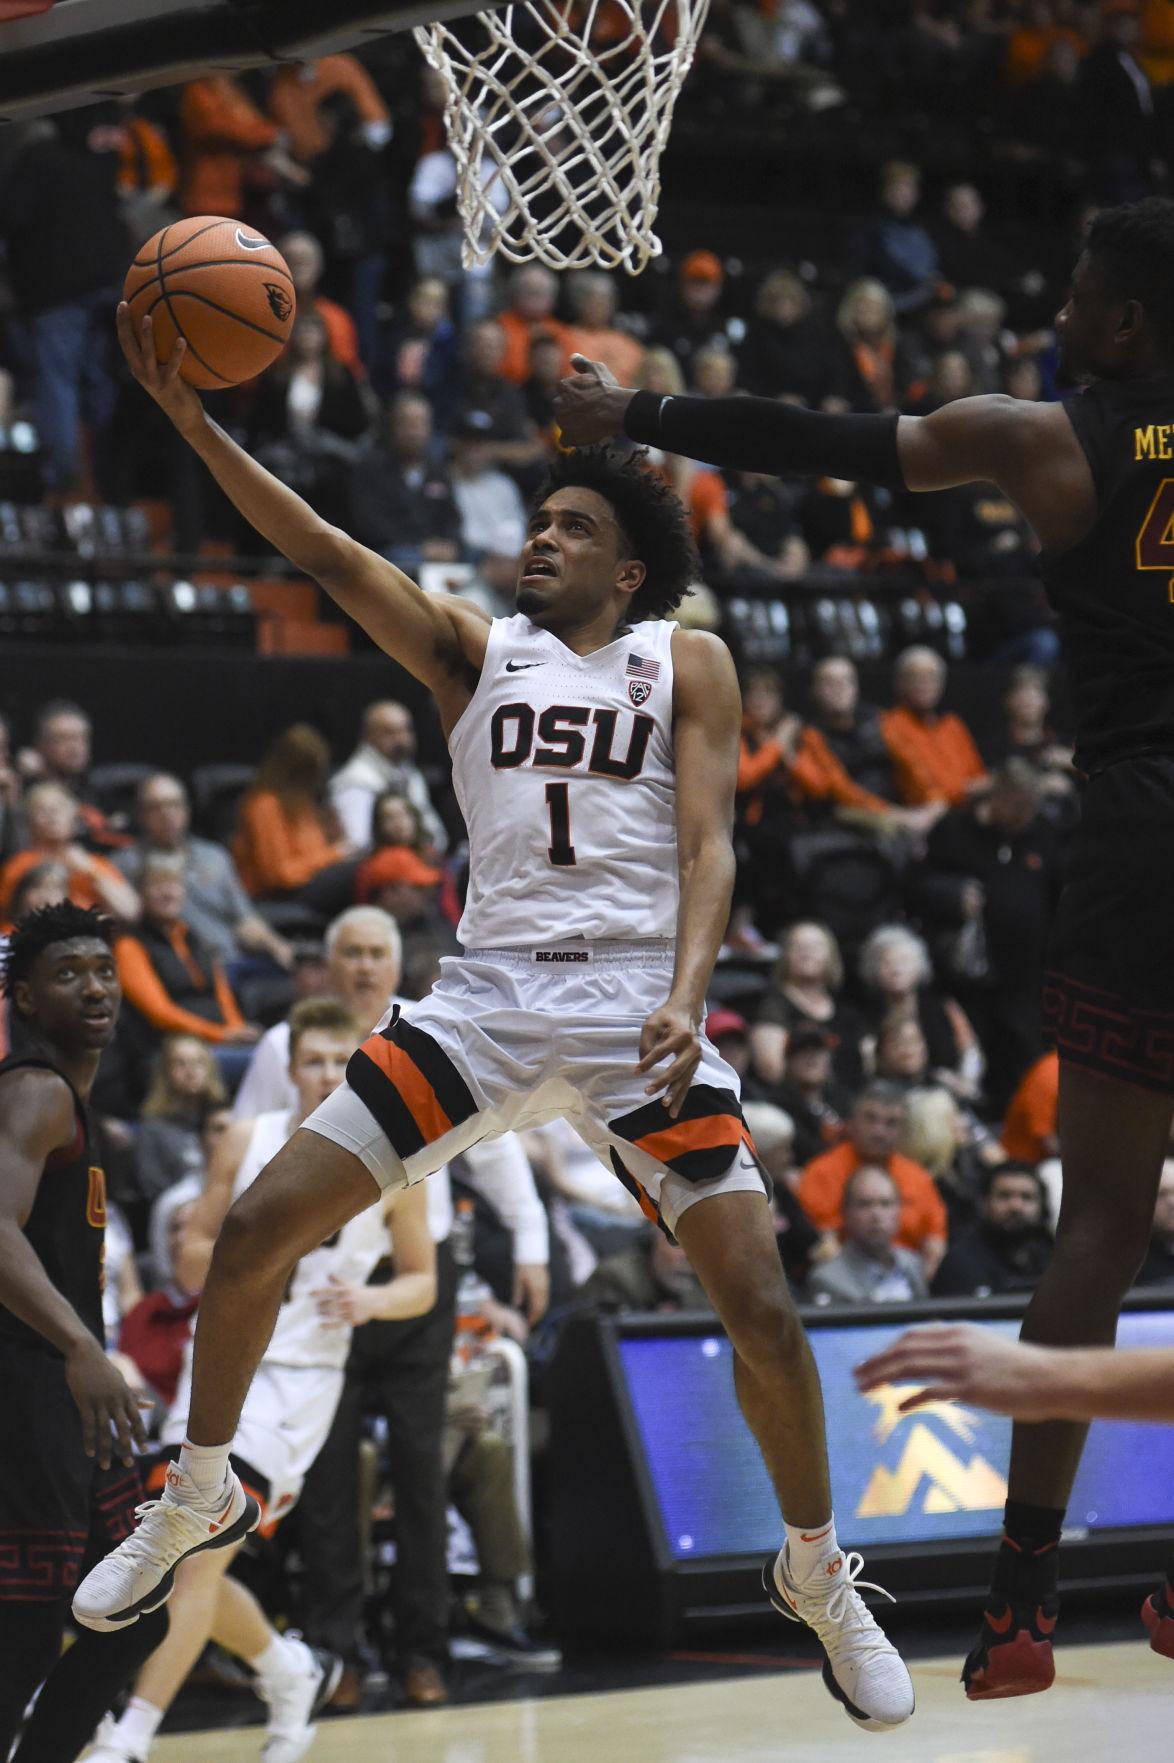 Oregon State vs. USC Men's Basketball-01